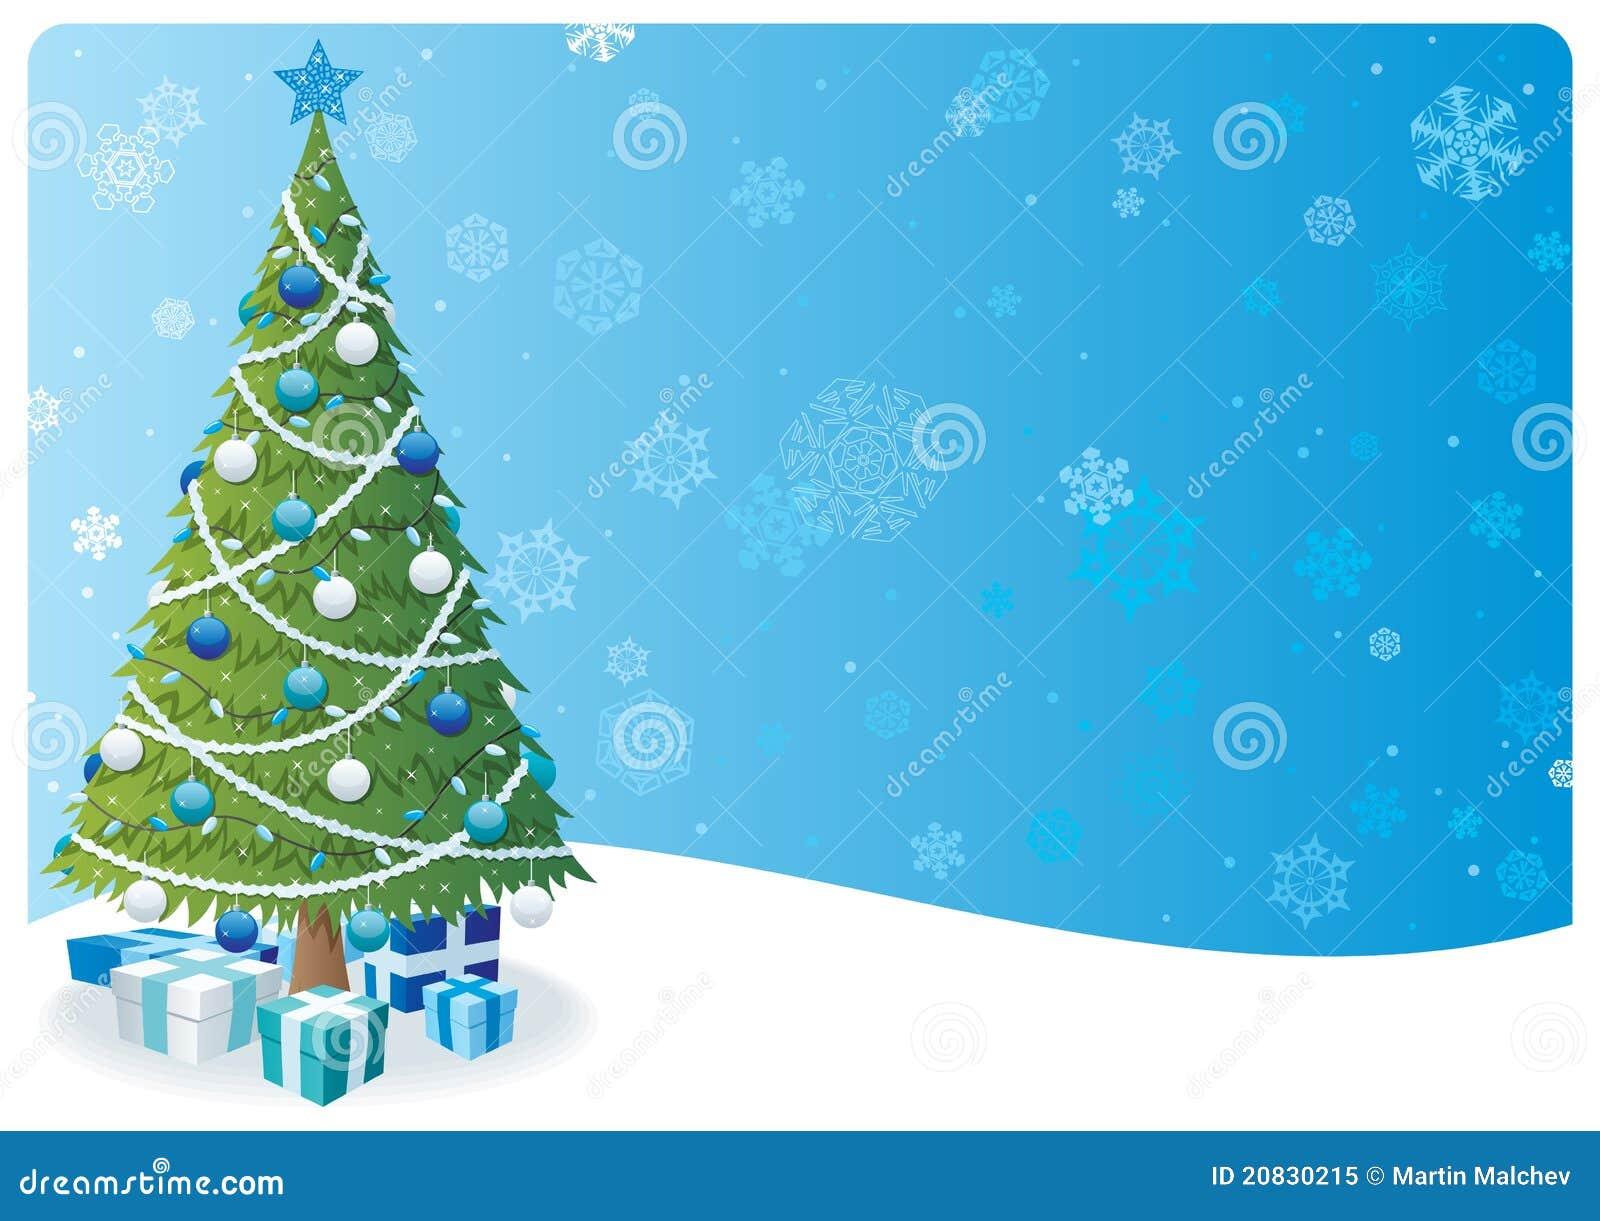 Christmas Tree Background 2 Stock Vector - Illustration of star ...